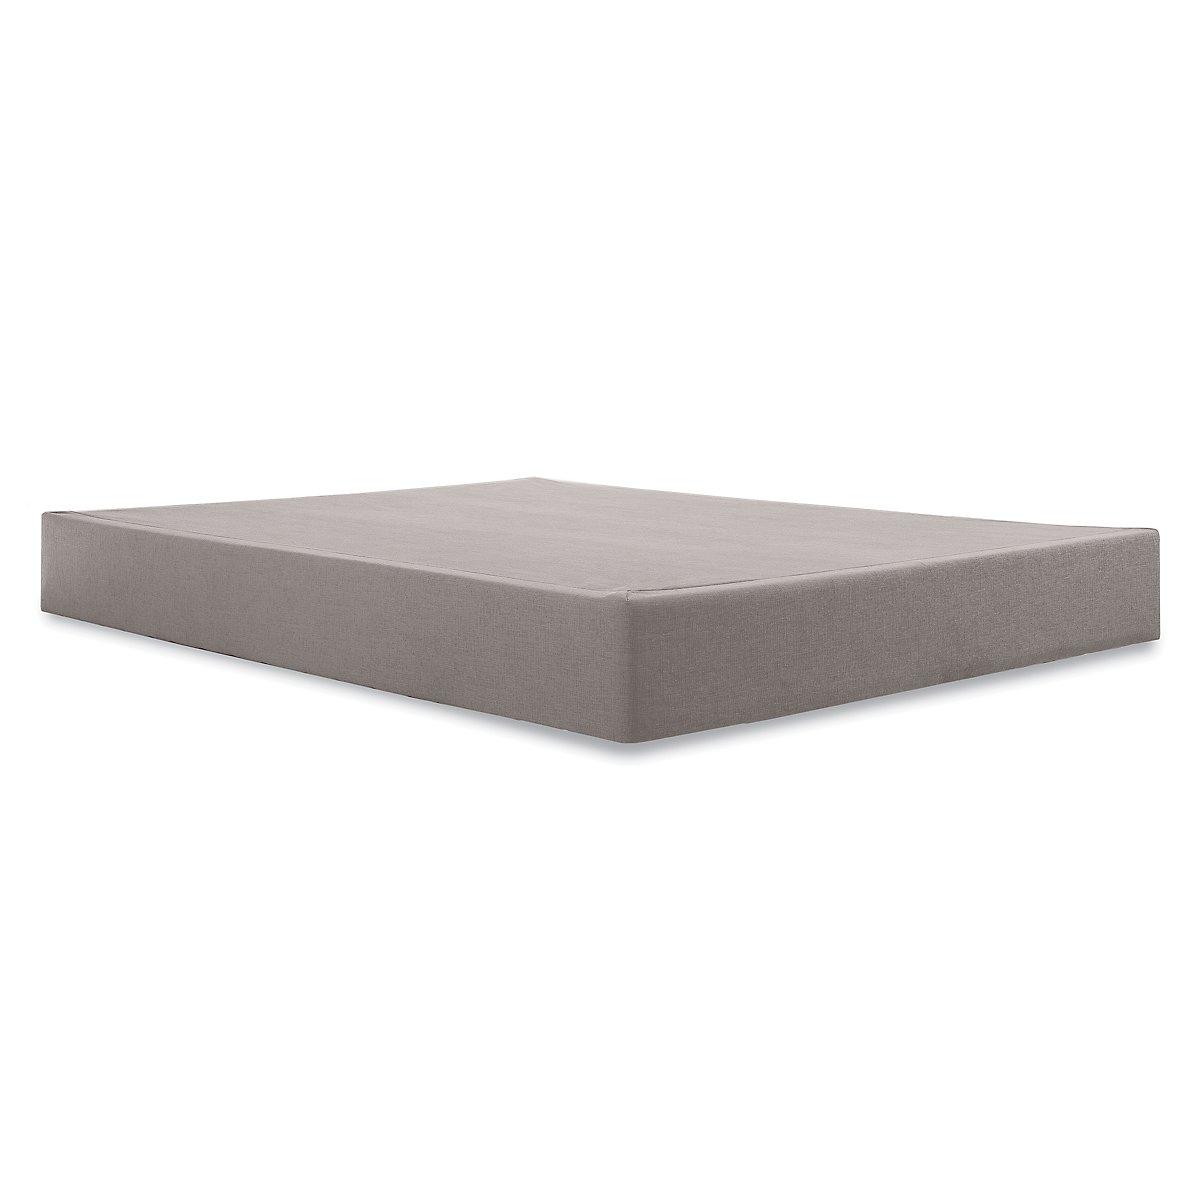 "TEMPUR-Flat High Profile Gray 9"" Foundation"